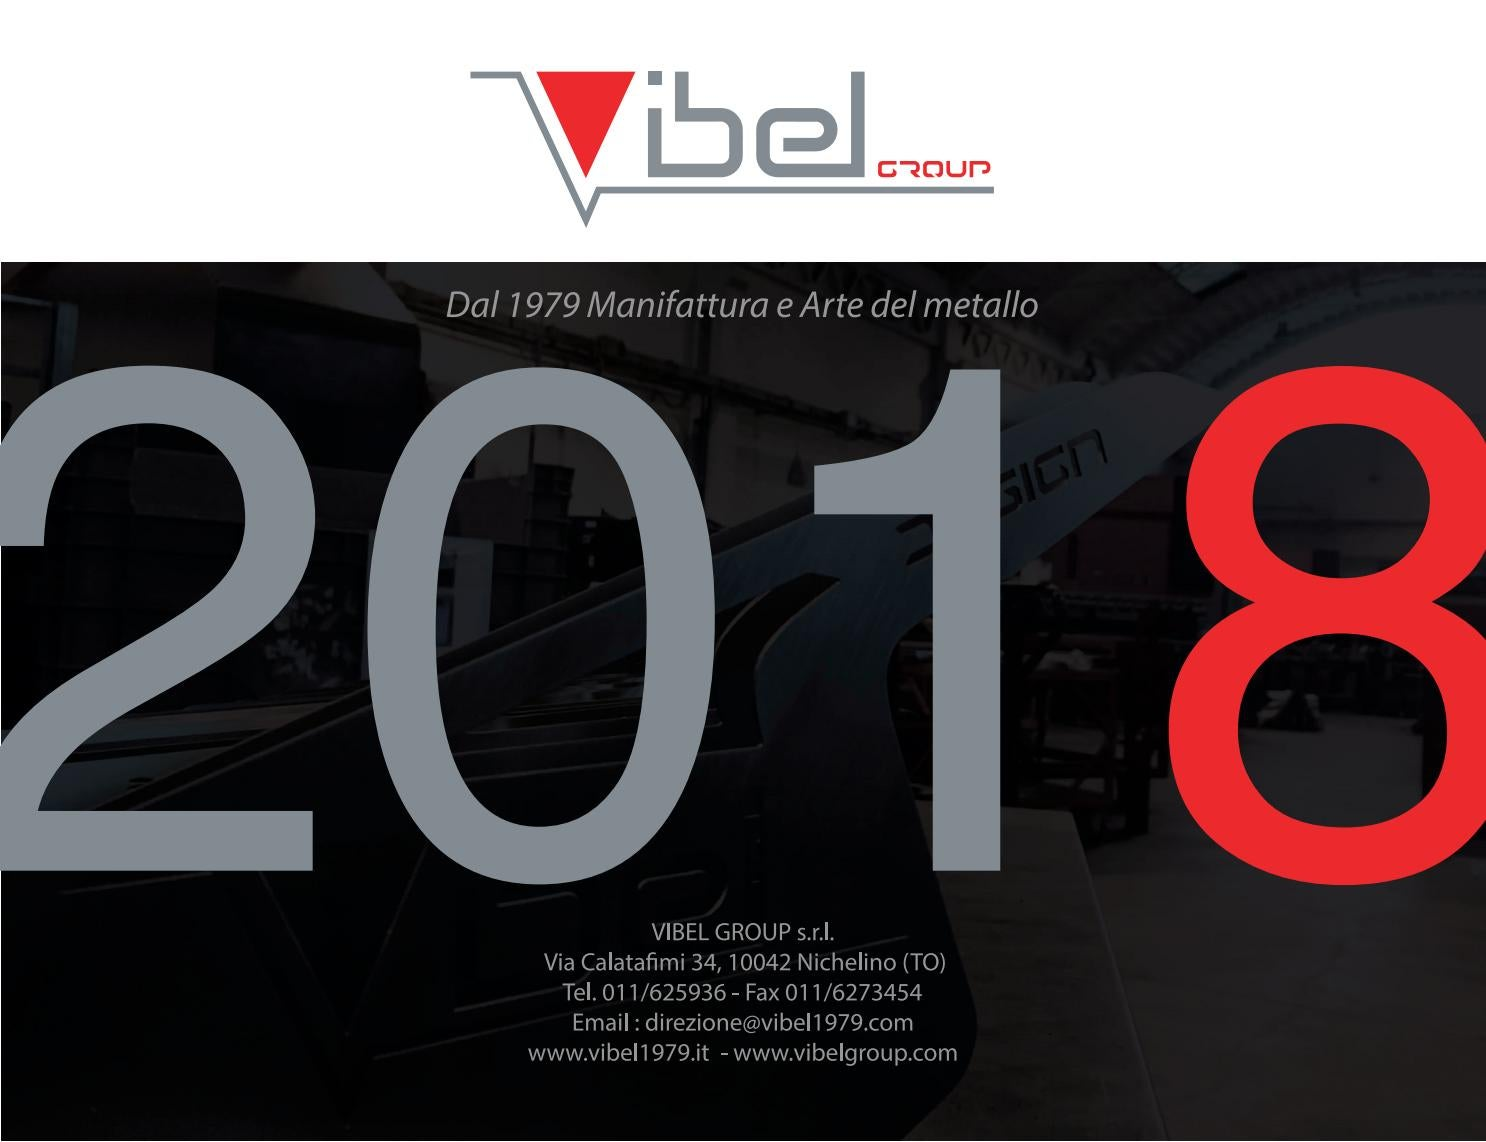 Calendario Del 1979.Calendario Vibel Group 2018 By Vibel Group Issuu